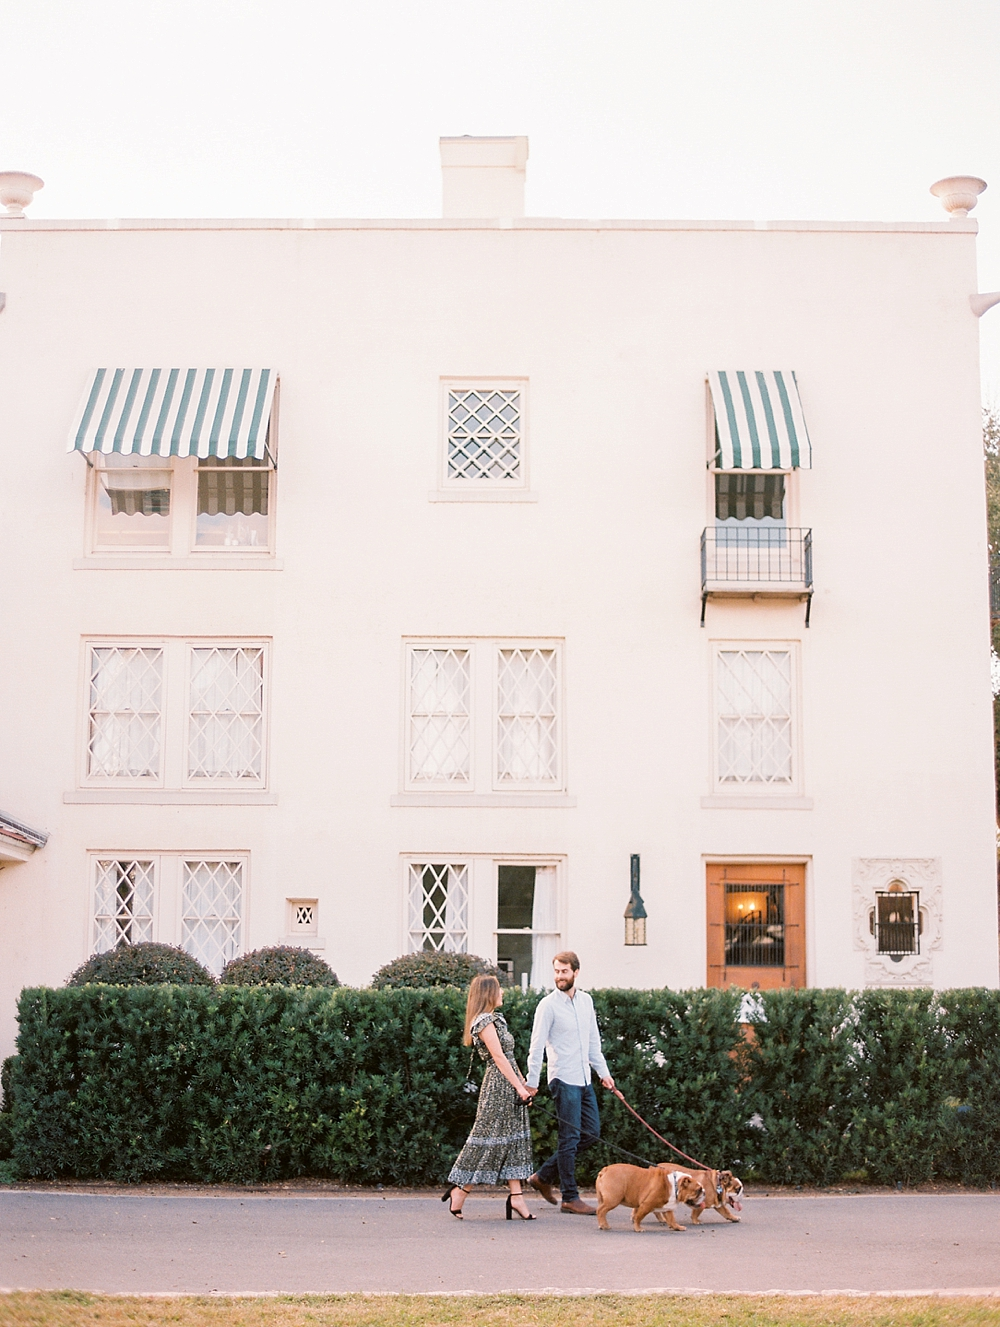 kristin-la-voie-photography-Austin-Wedding-Photographer-laguna-gloria-commodore-perry-estate-engagement-46